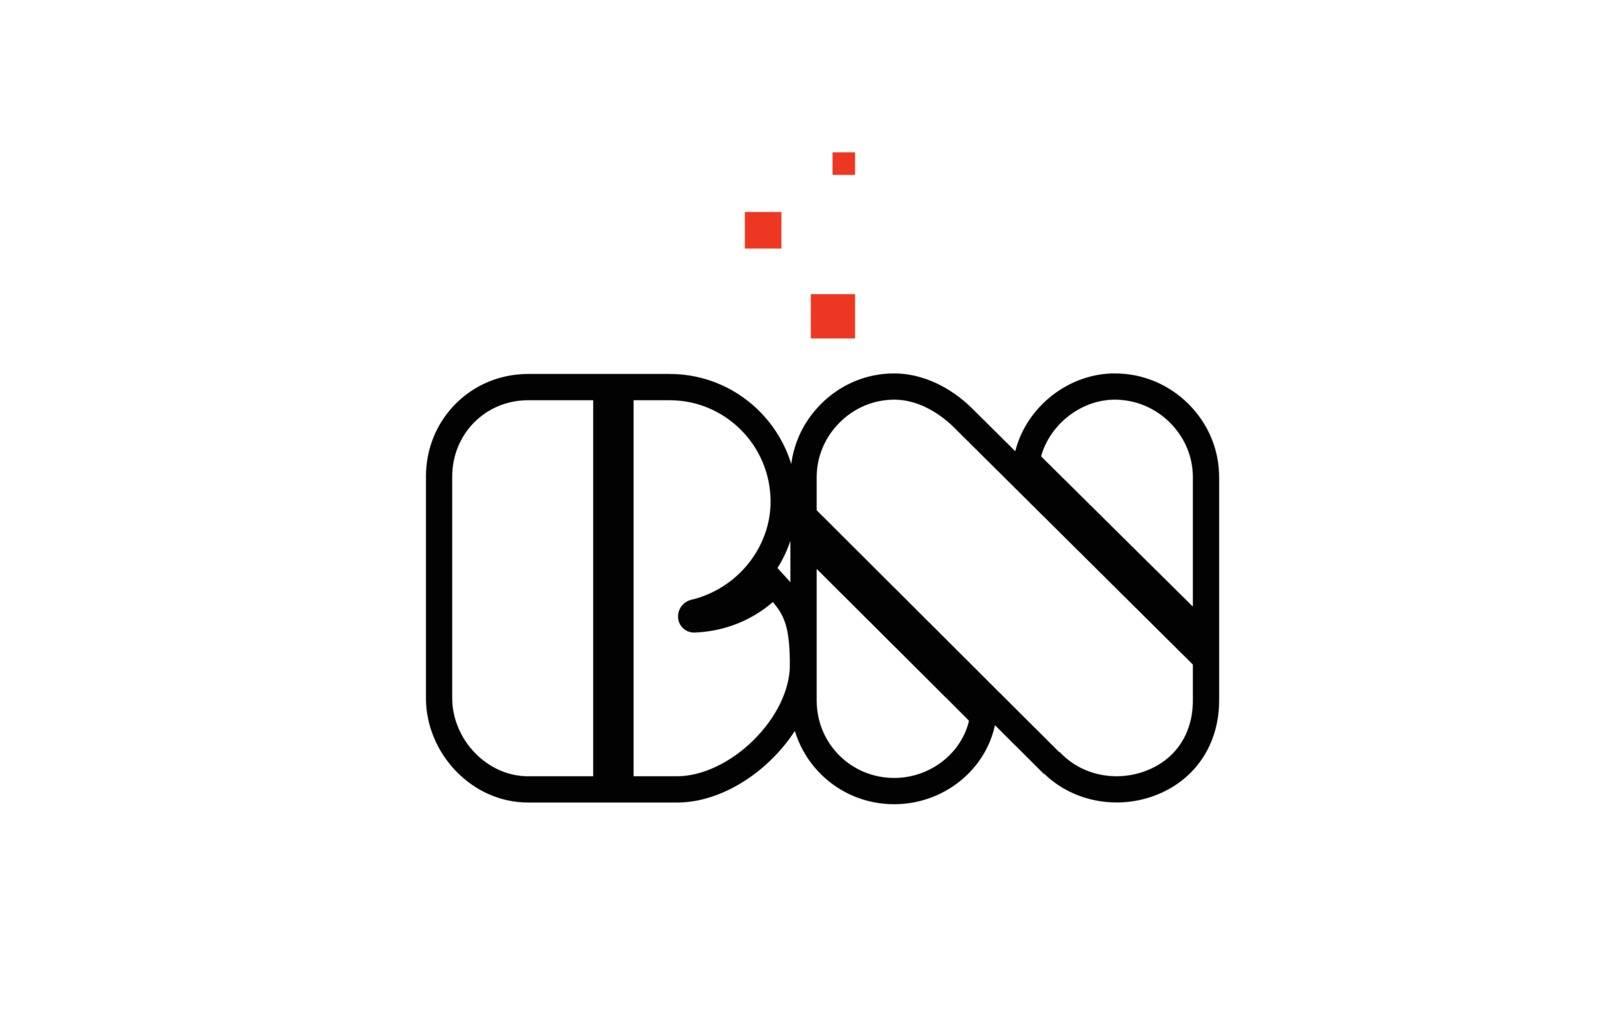 BN B N black white red alphabet letter combination logo icon des by dragomirescu